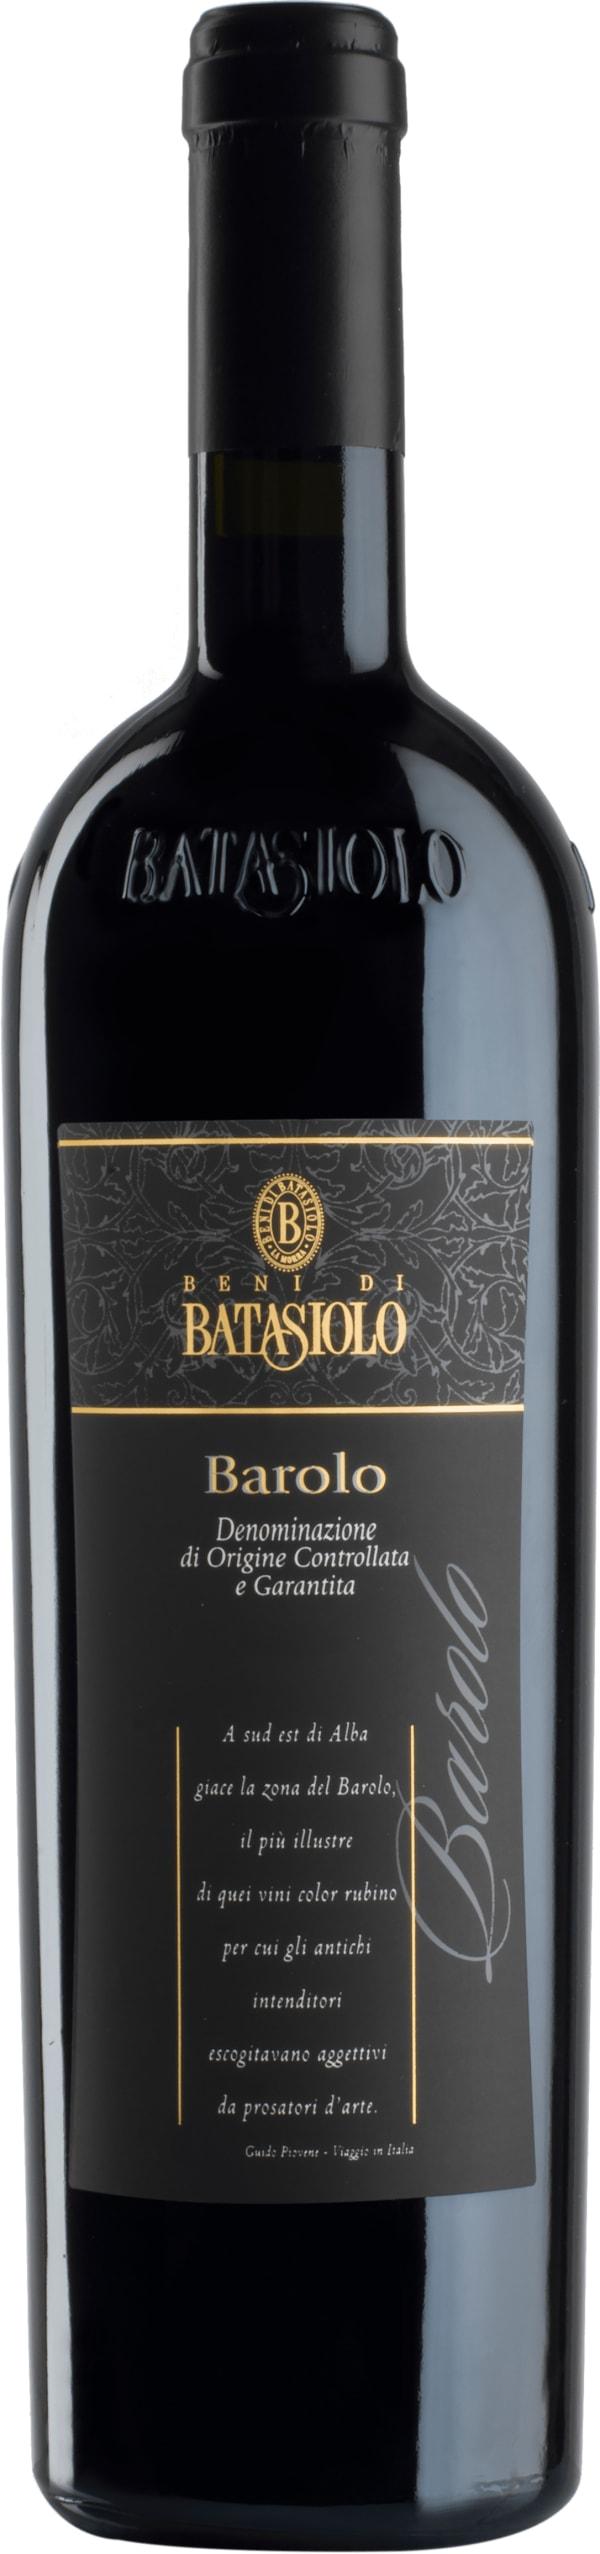 Barolo Batasiolo 2016